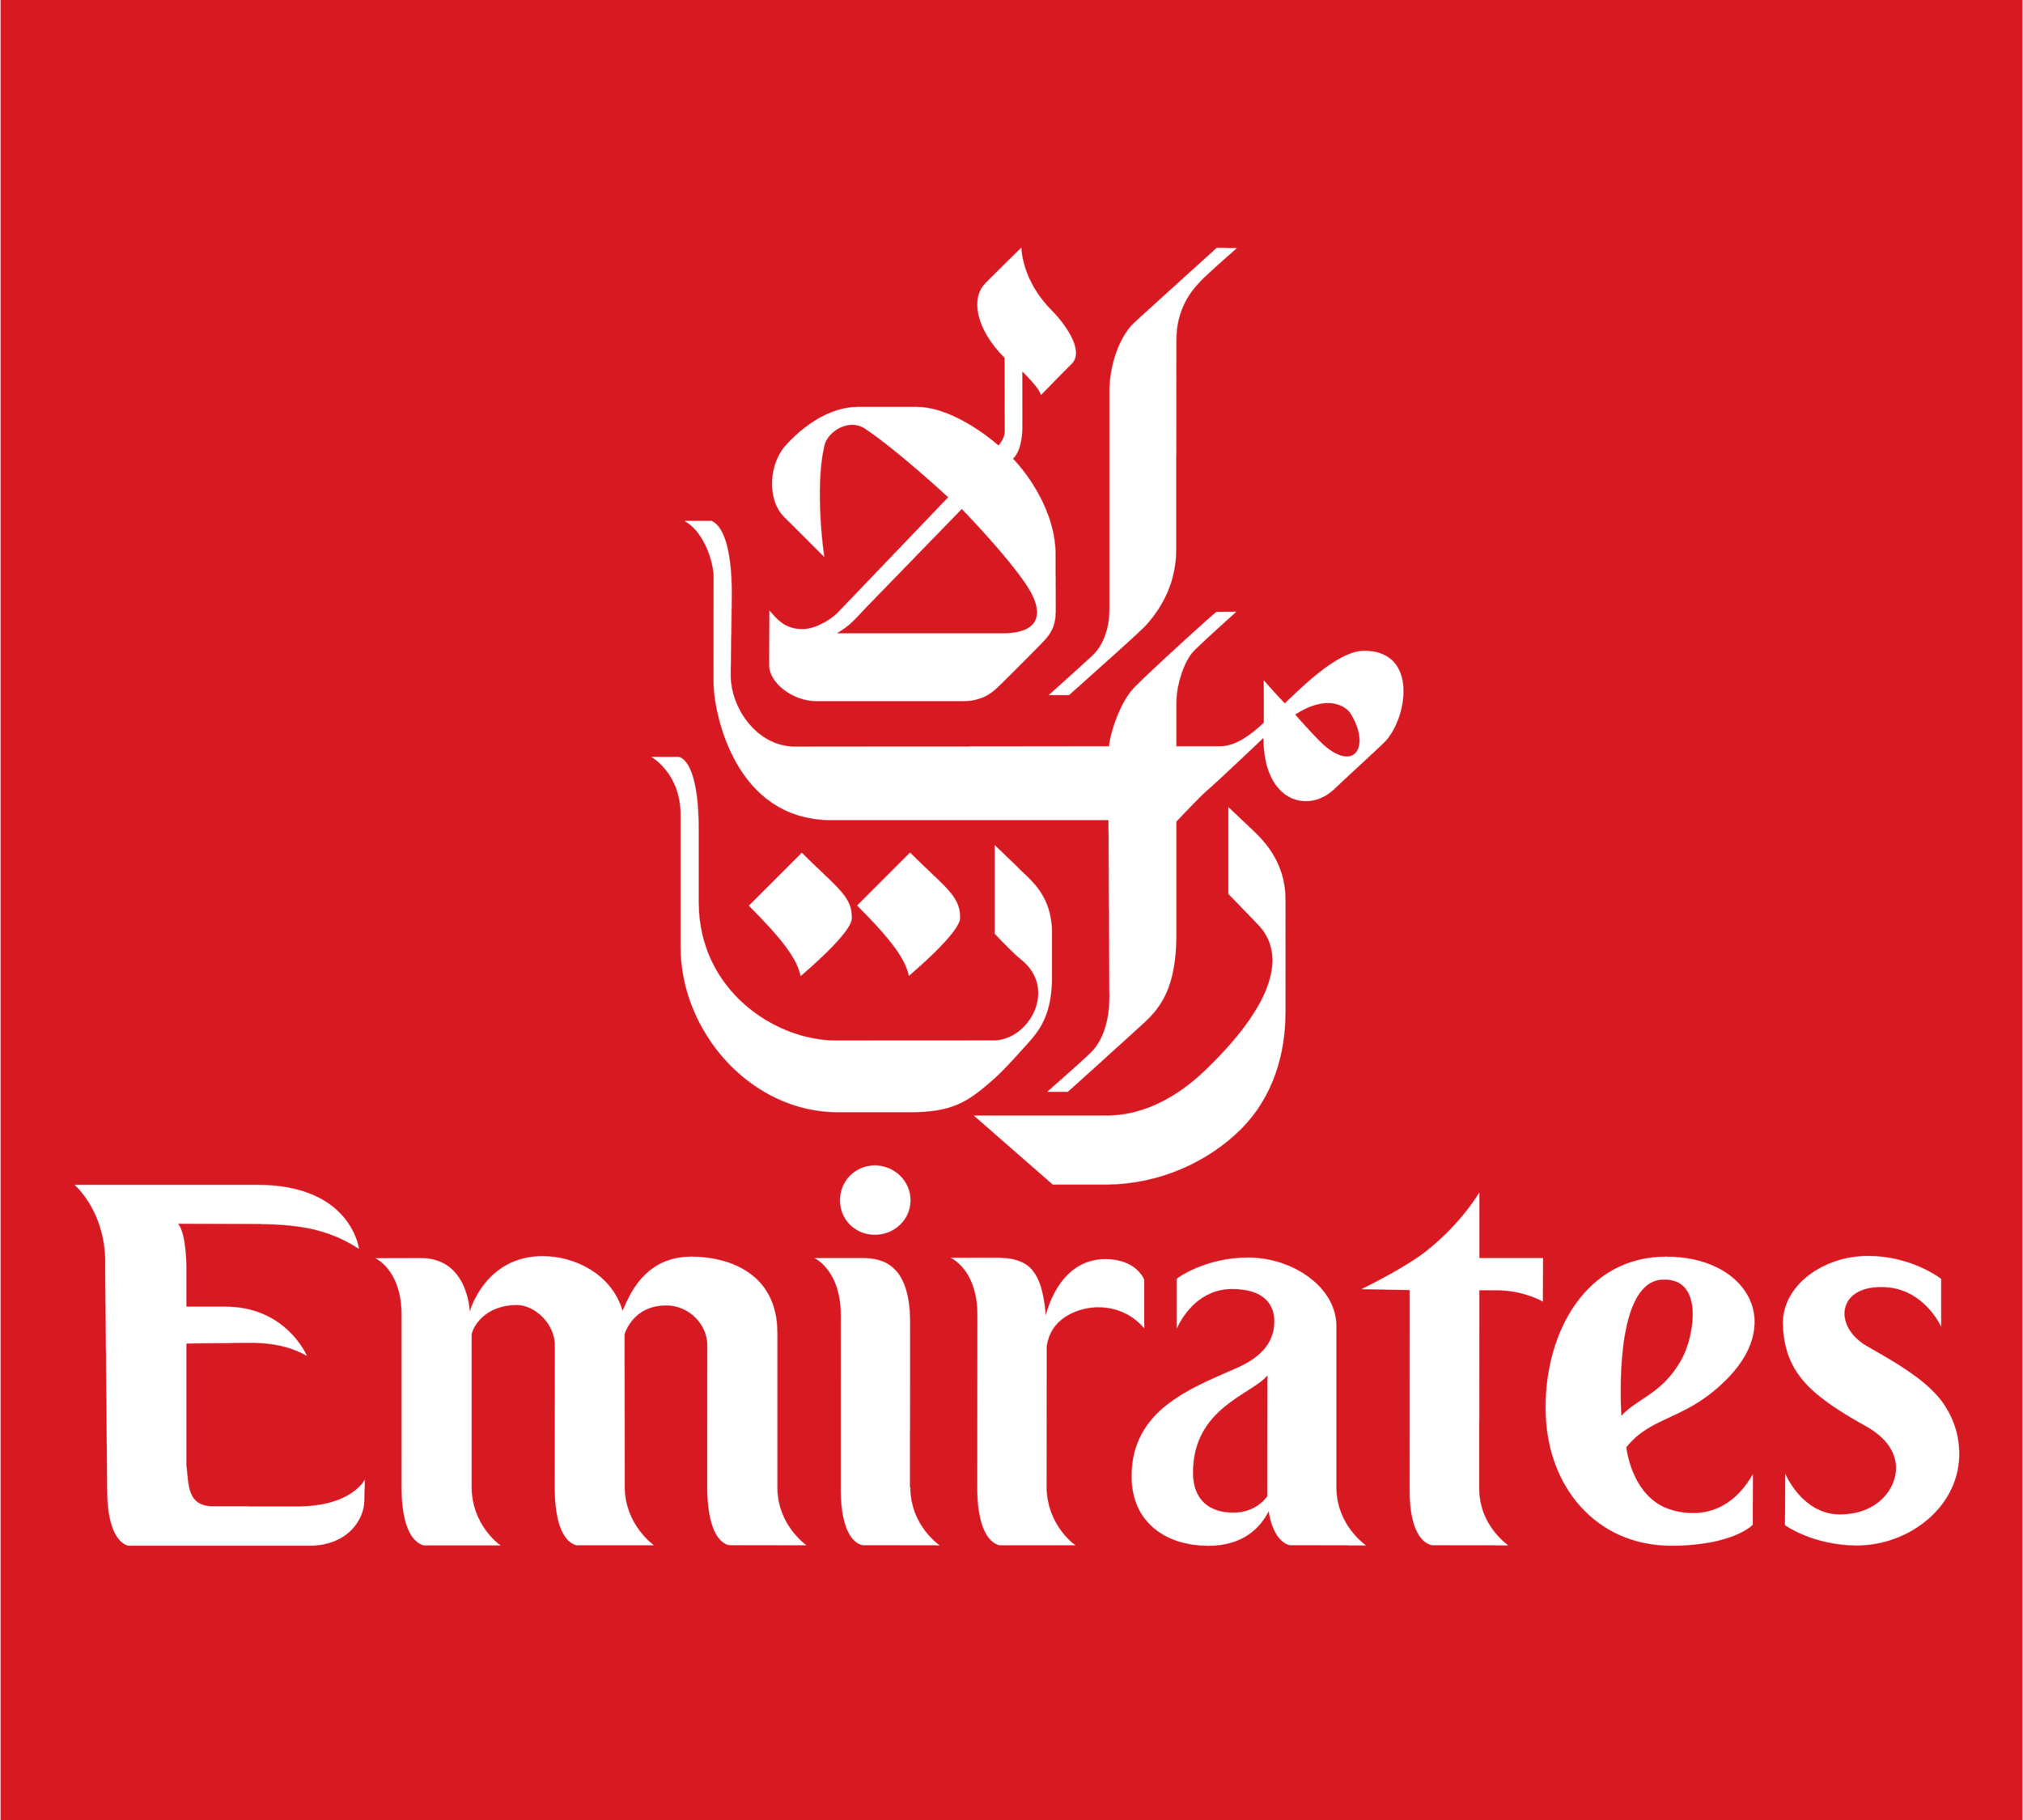 Emirates Sq 2.png